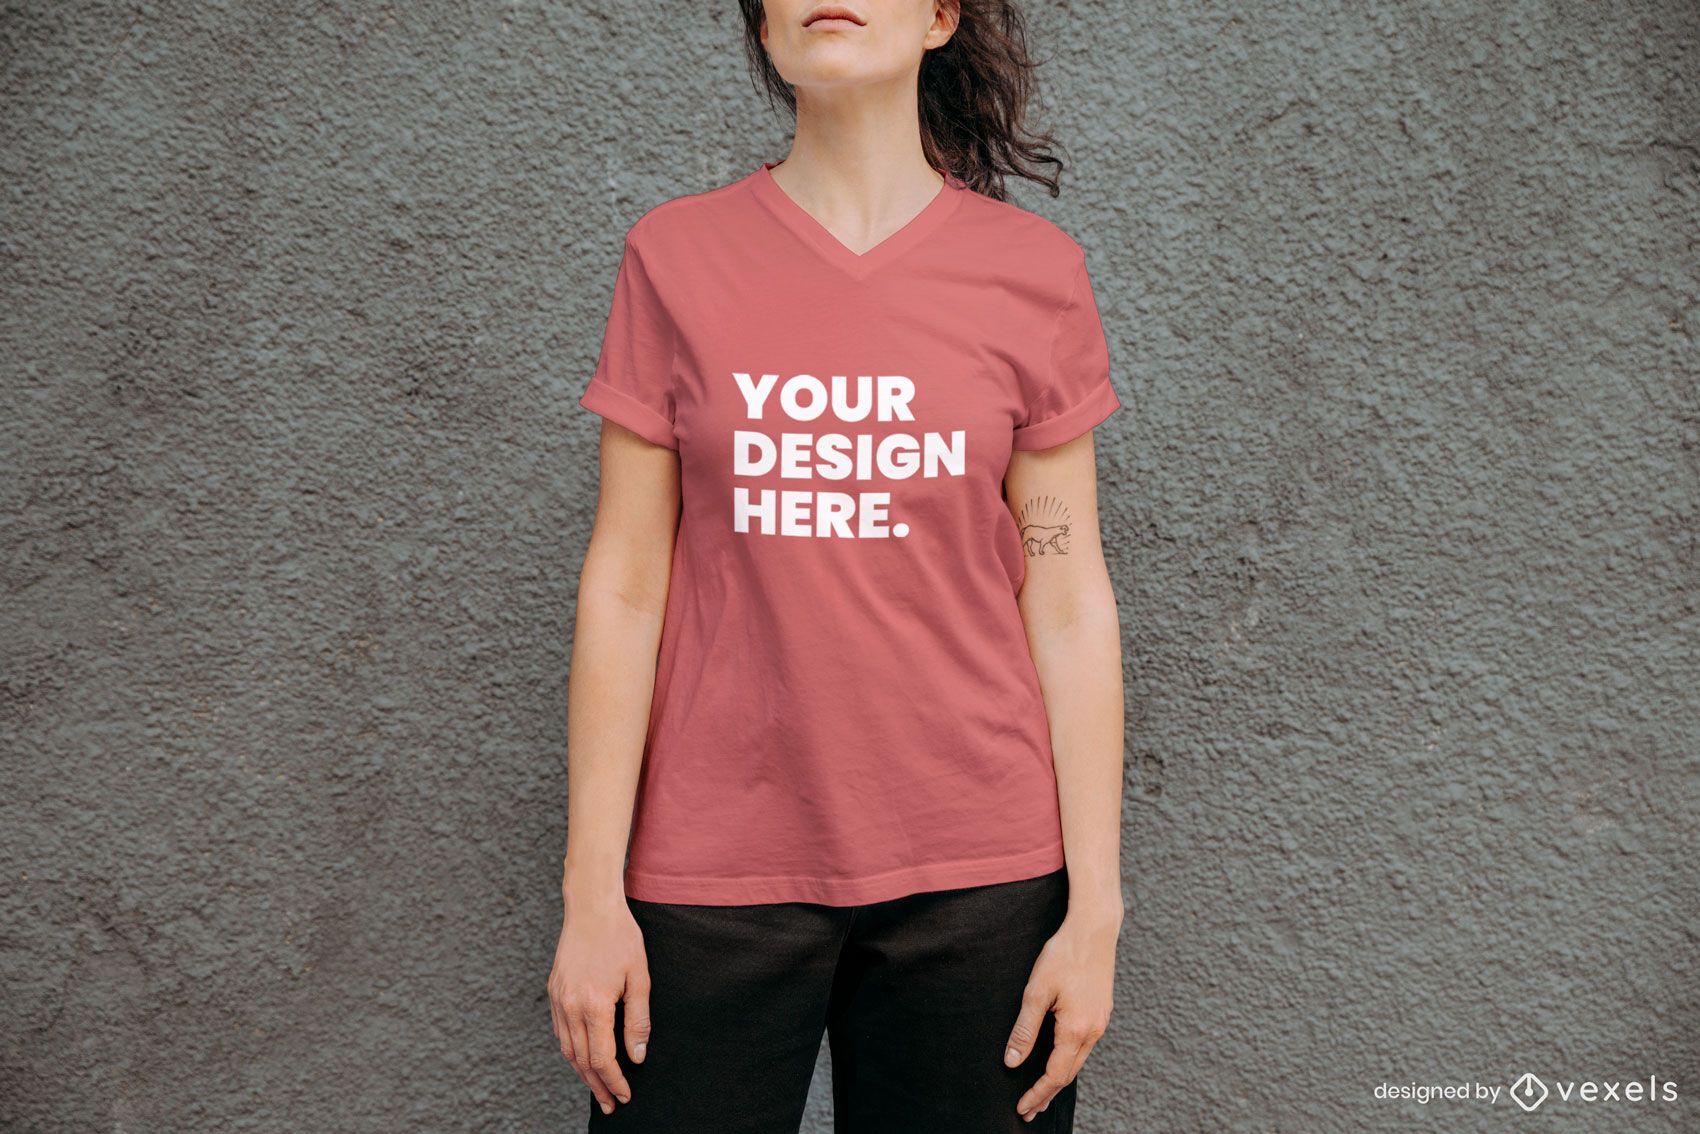 Maquete de camiseta de parede de concreto